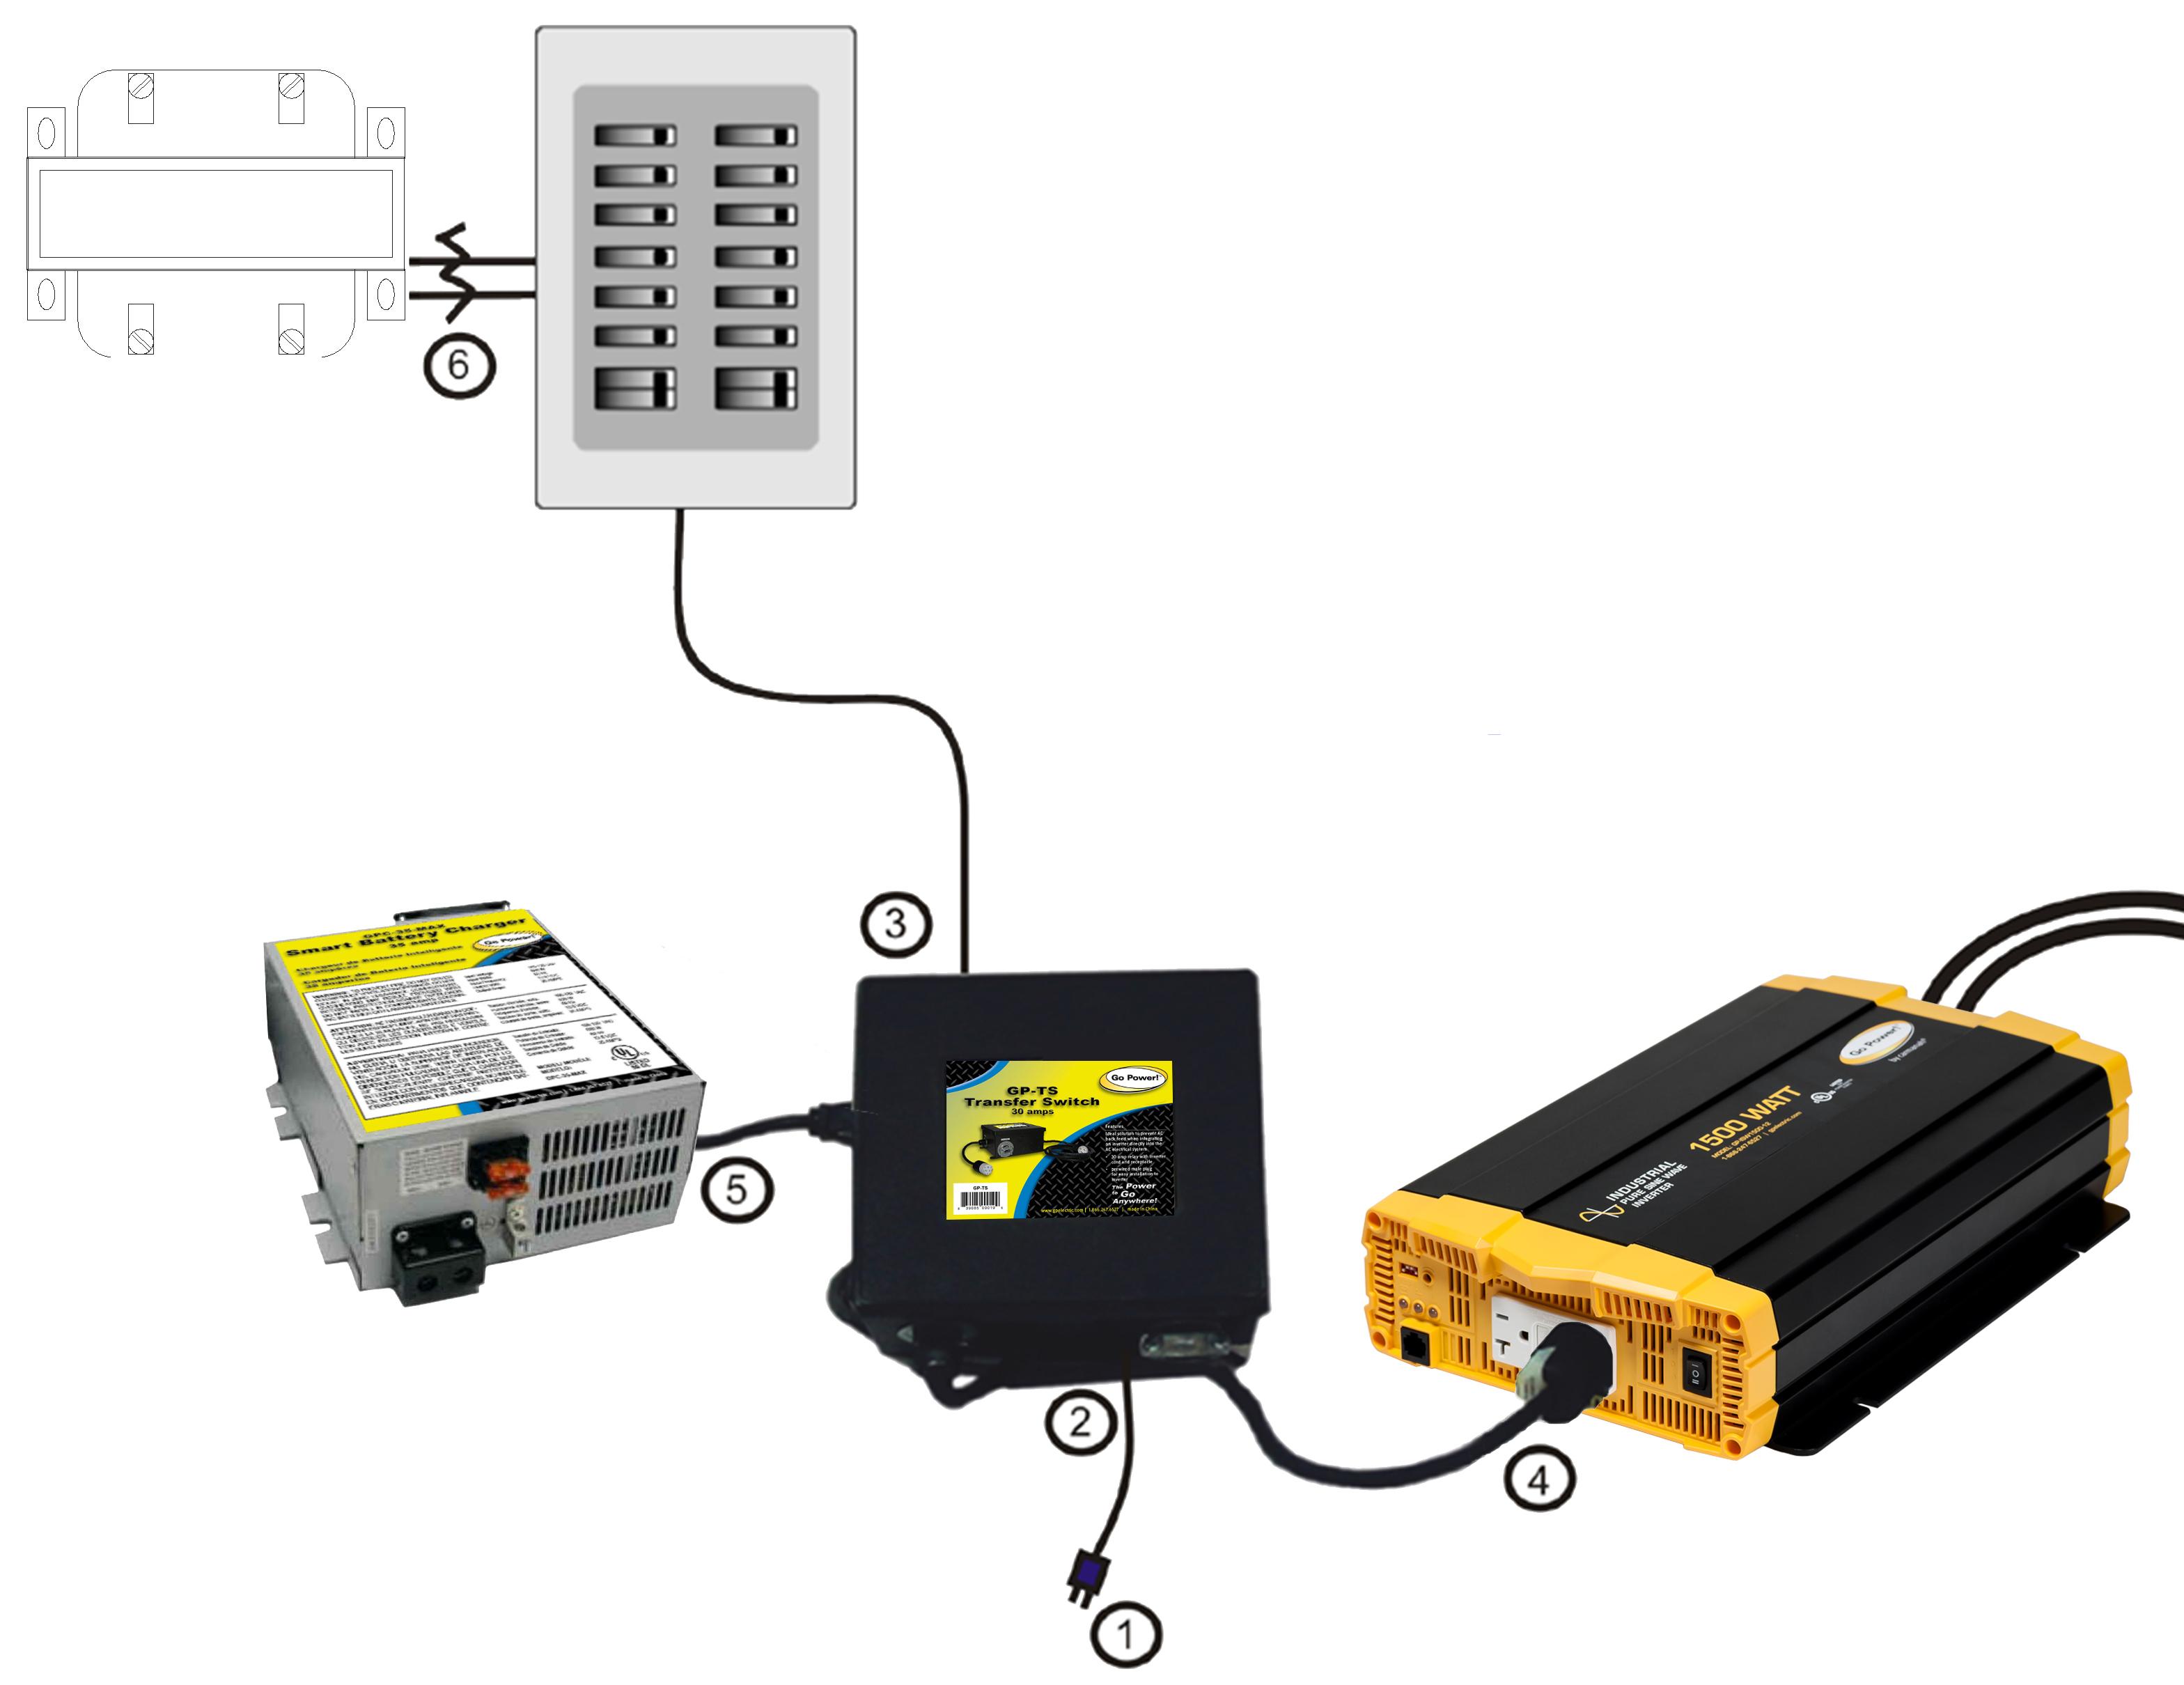 50 Amp Rv Transfer Switch Wiring Diagram | Wiring Diagram - Rv Transfer Switch Wiring Diagram